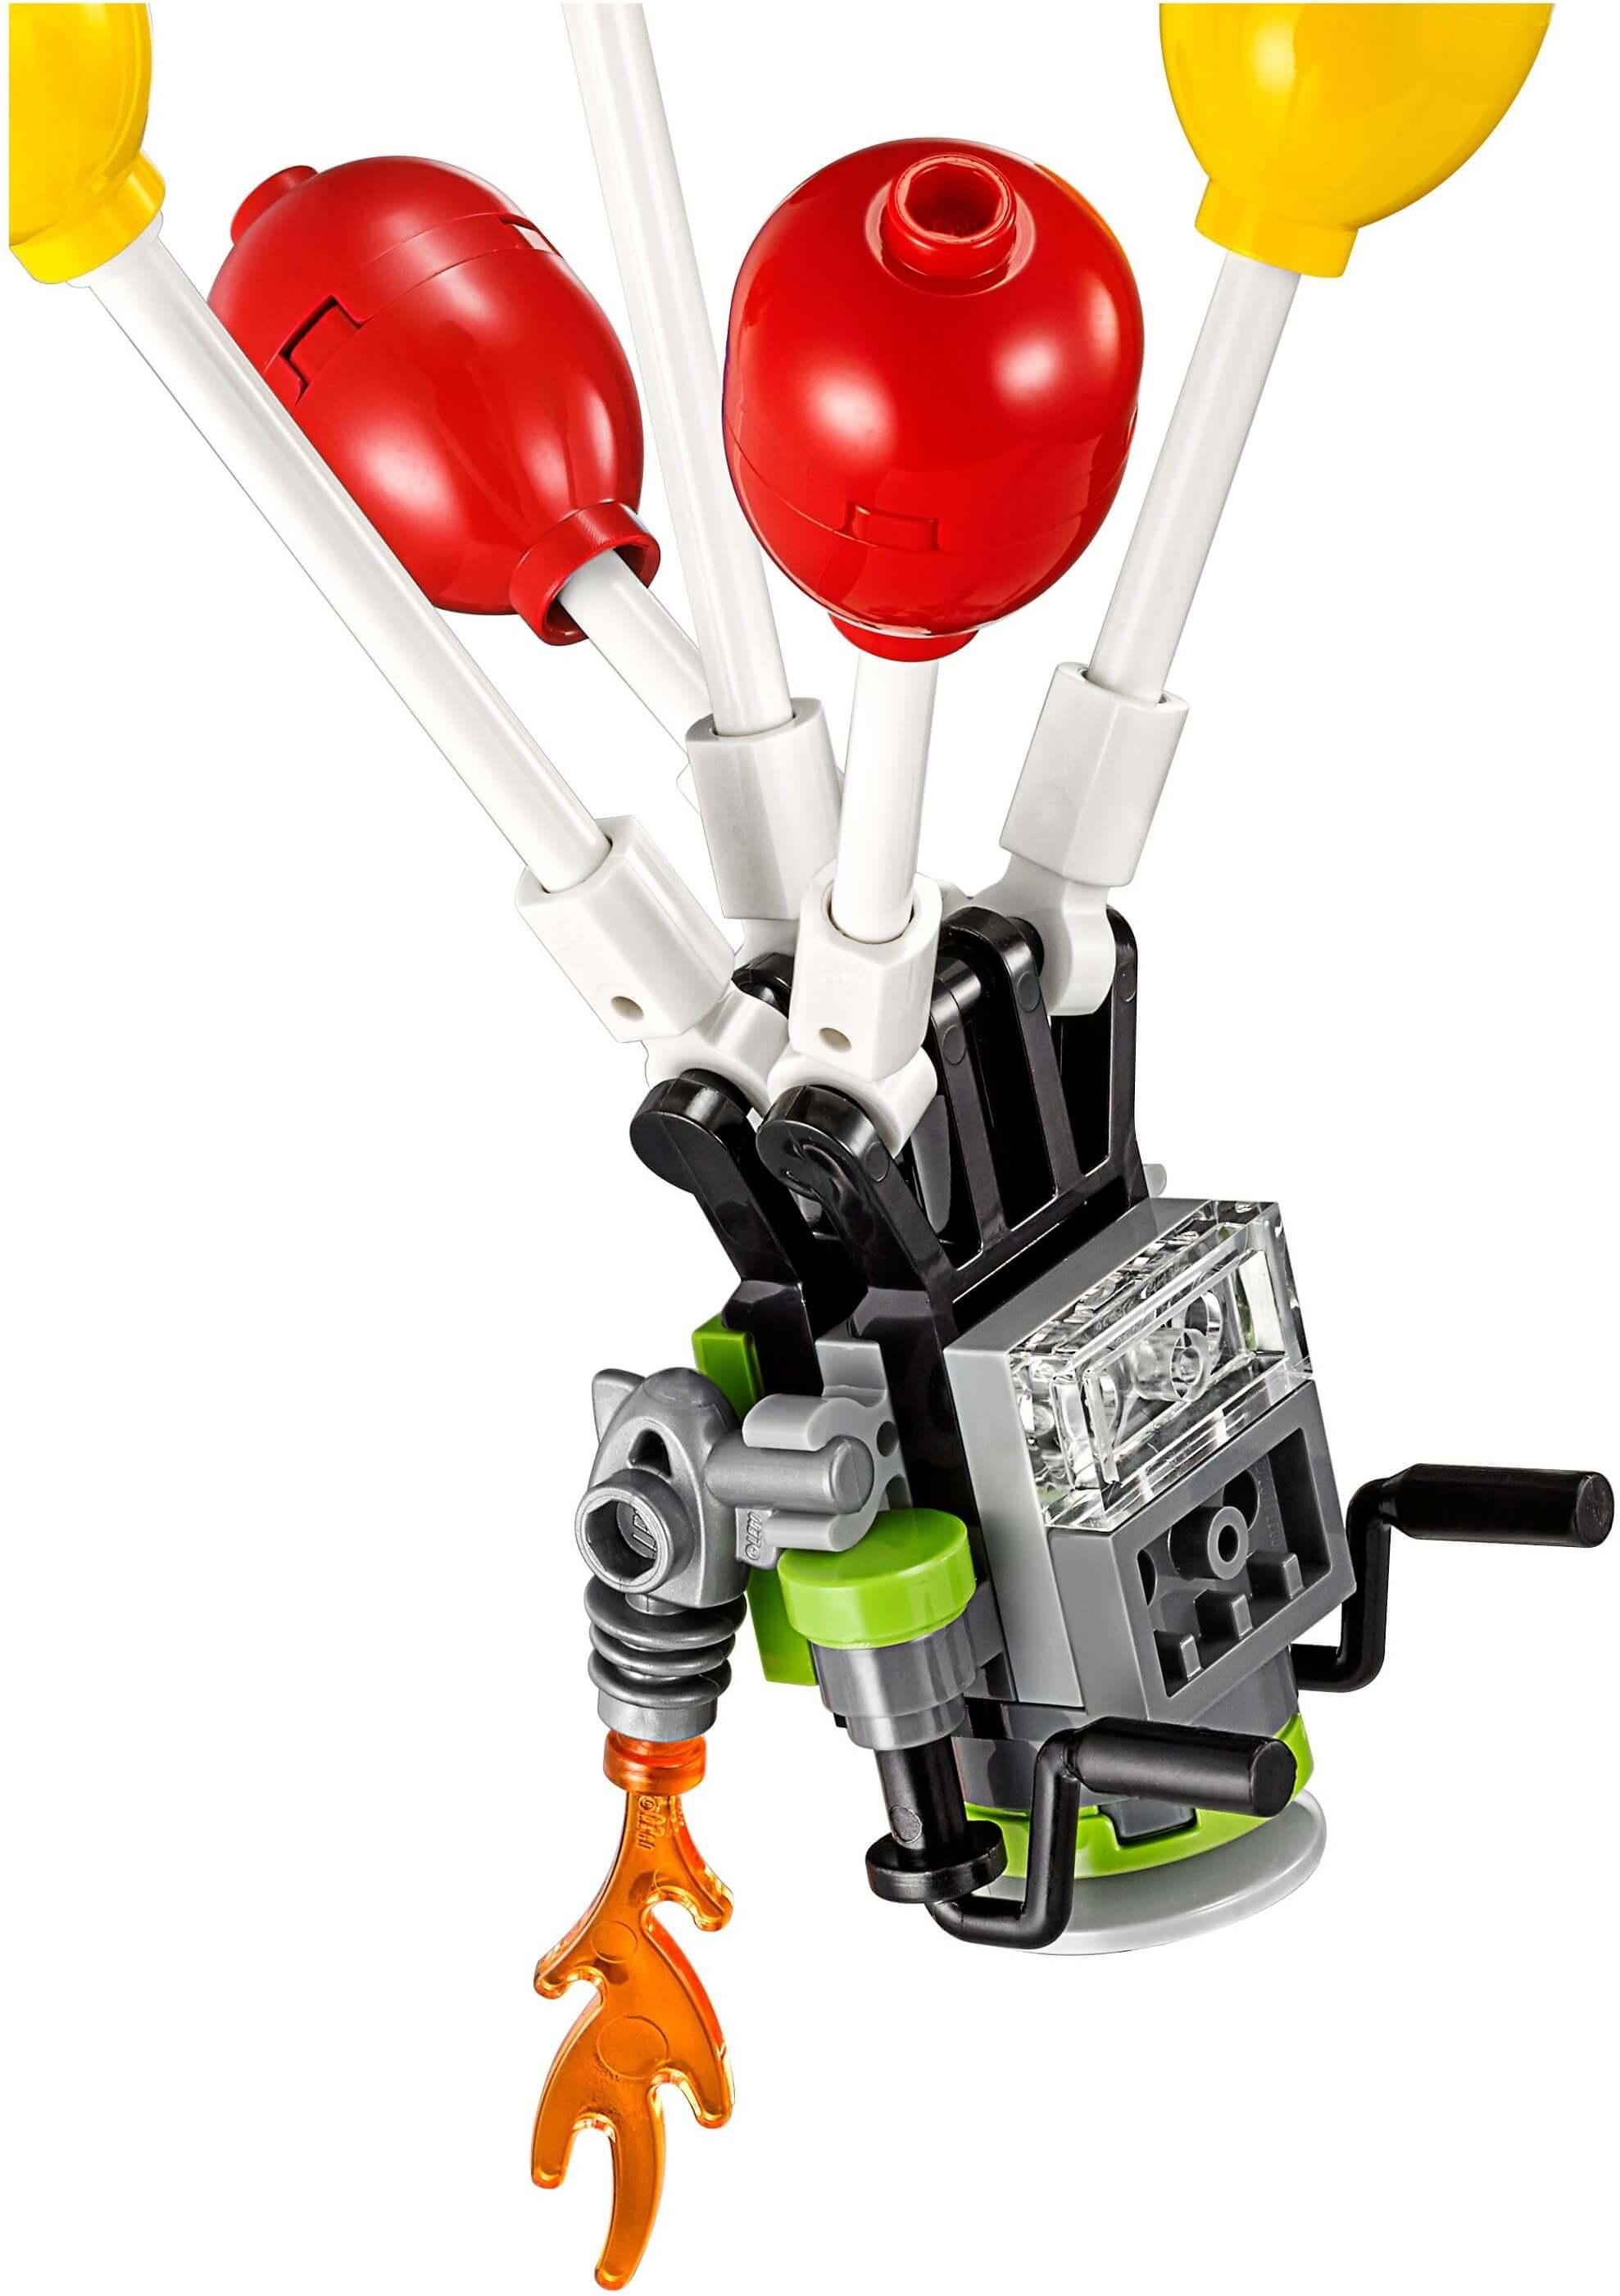 Mua đồ chơi LEGO 70900 - LEGO Batman Movie 70900 - Cuộc Tẩu Thoát của Joker (LEGO 70900 The Joker Balloon Escape)